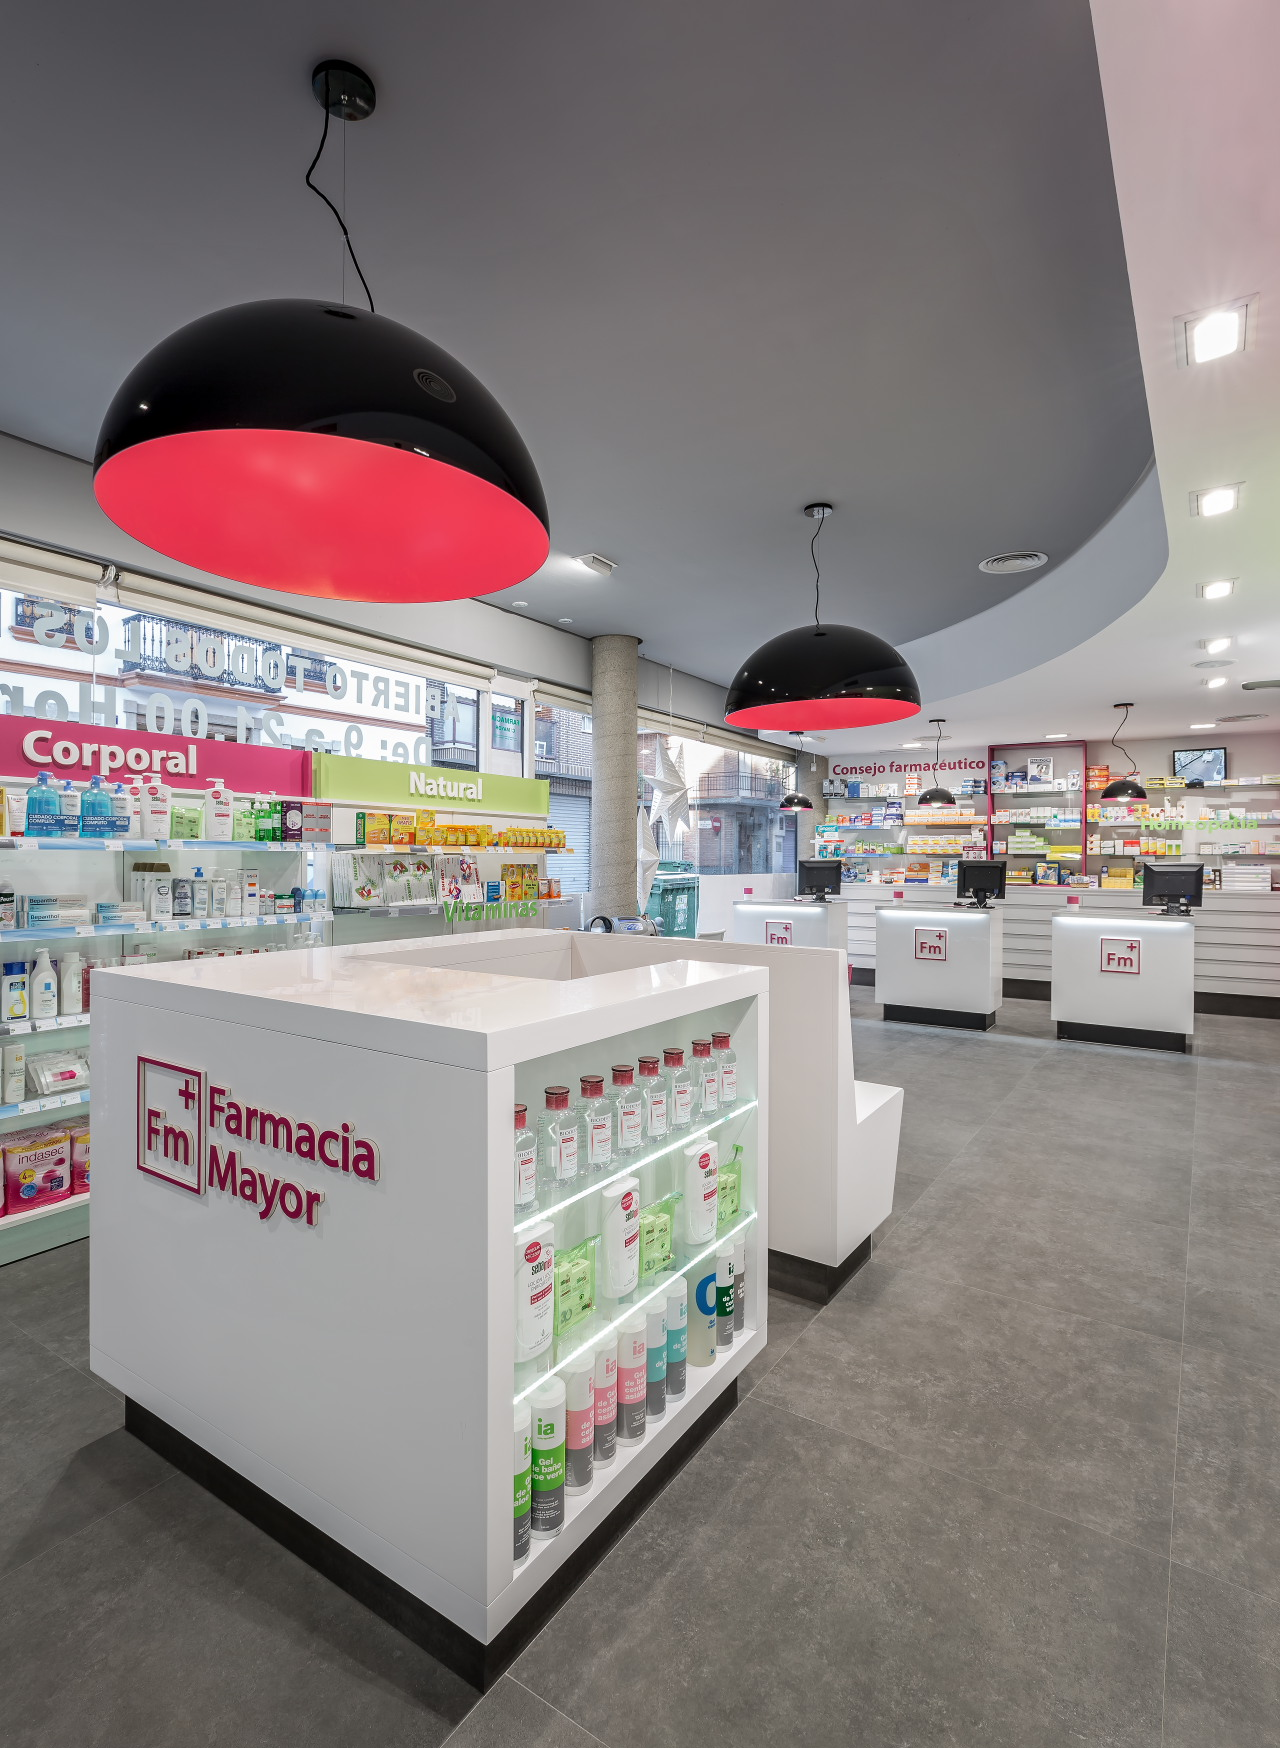 fotografia-arquitectura-valencia-german-cabo-d'estudio-farmacia-mayor-xirivella (6)